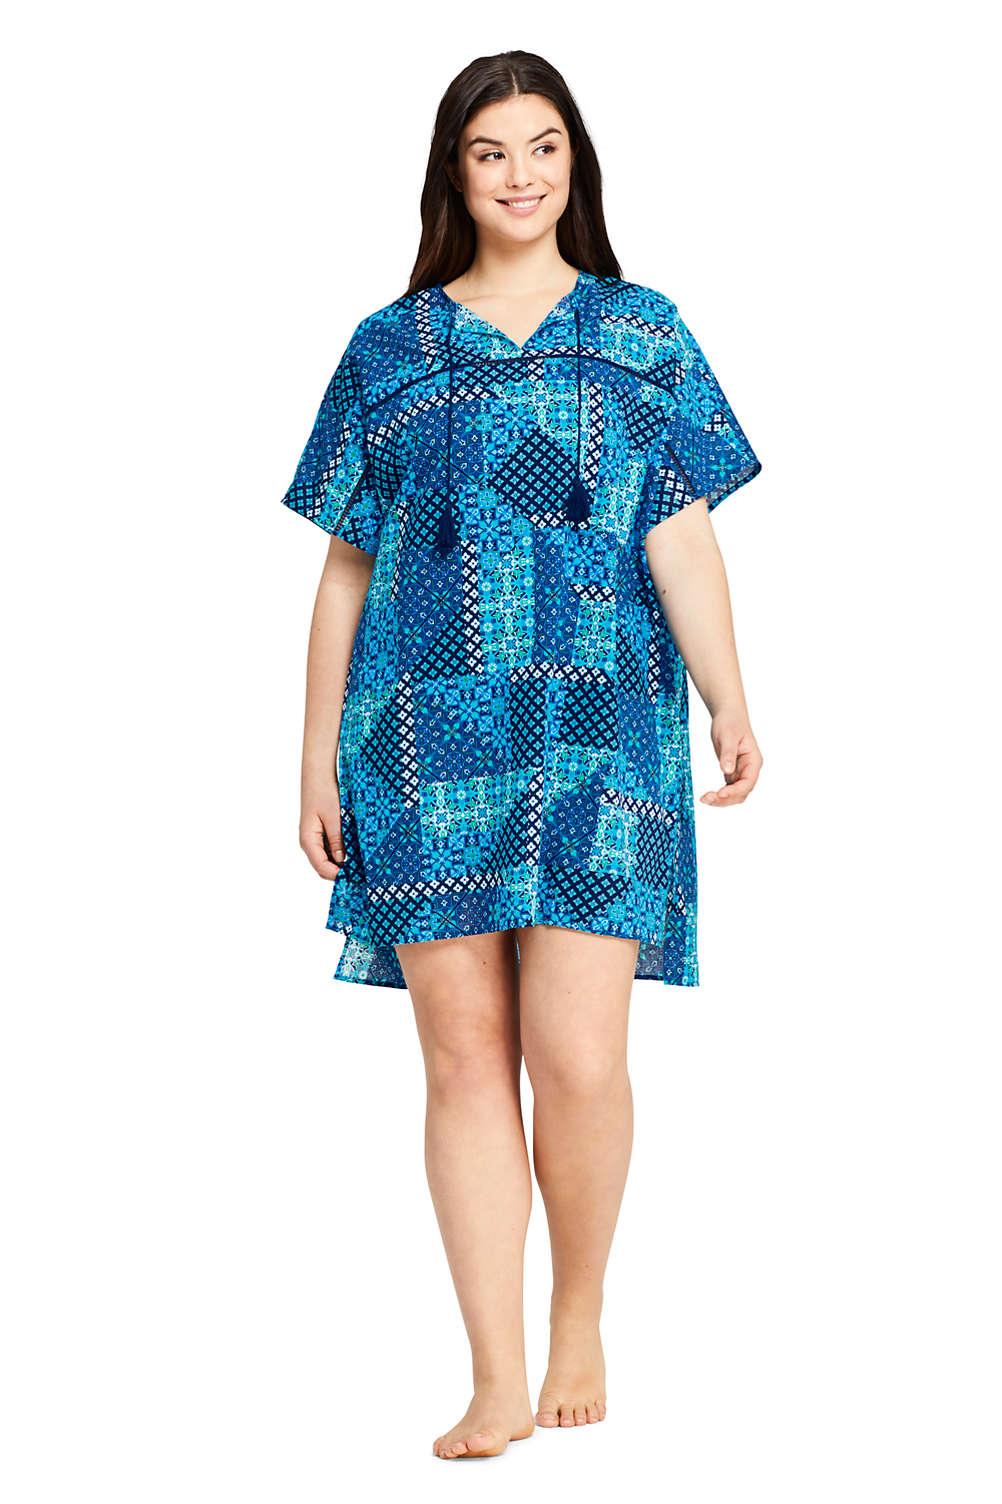 8a3c6435fc60c1 Women's Plus Size Cotton Voile Short Sleeve Kaftan Swim Cover-up Print from  Lands' End